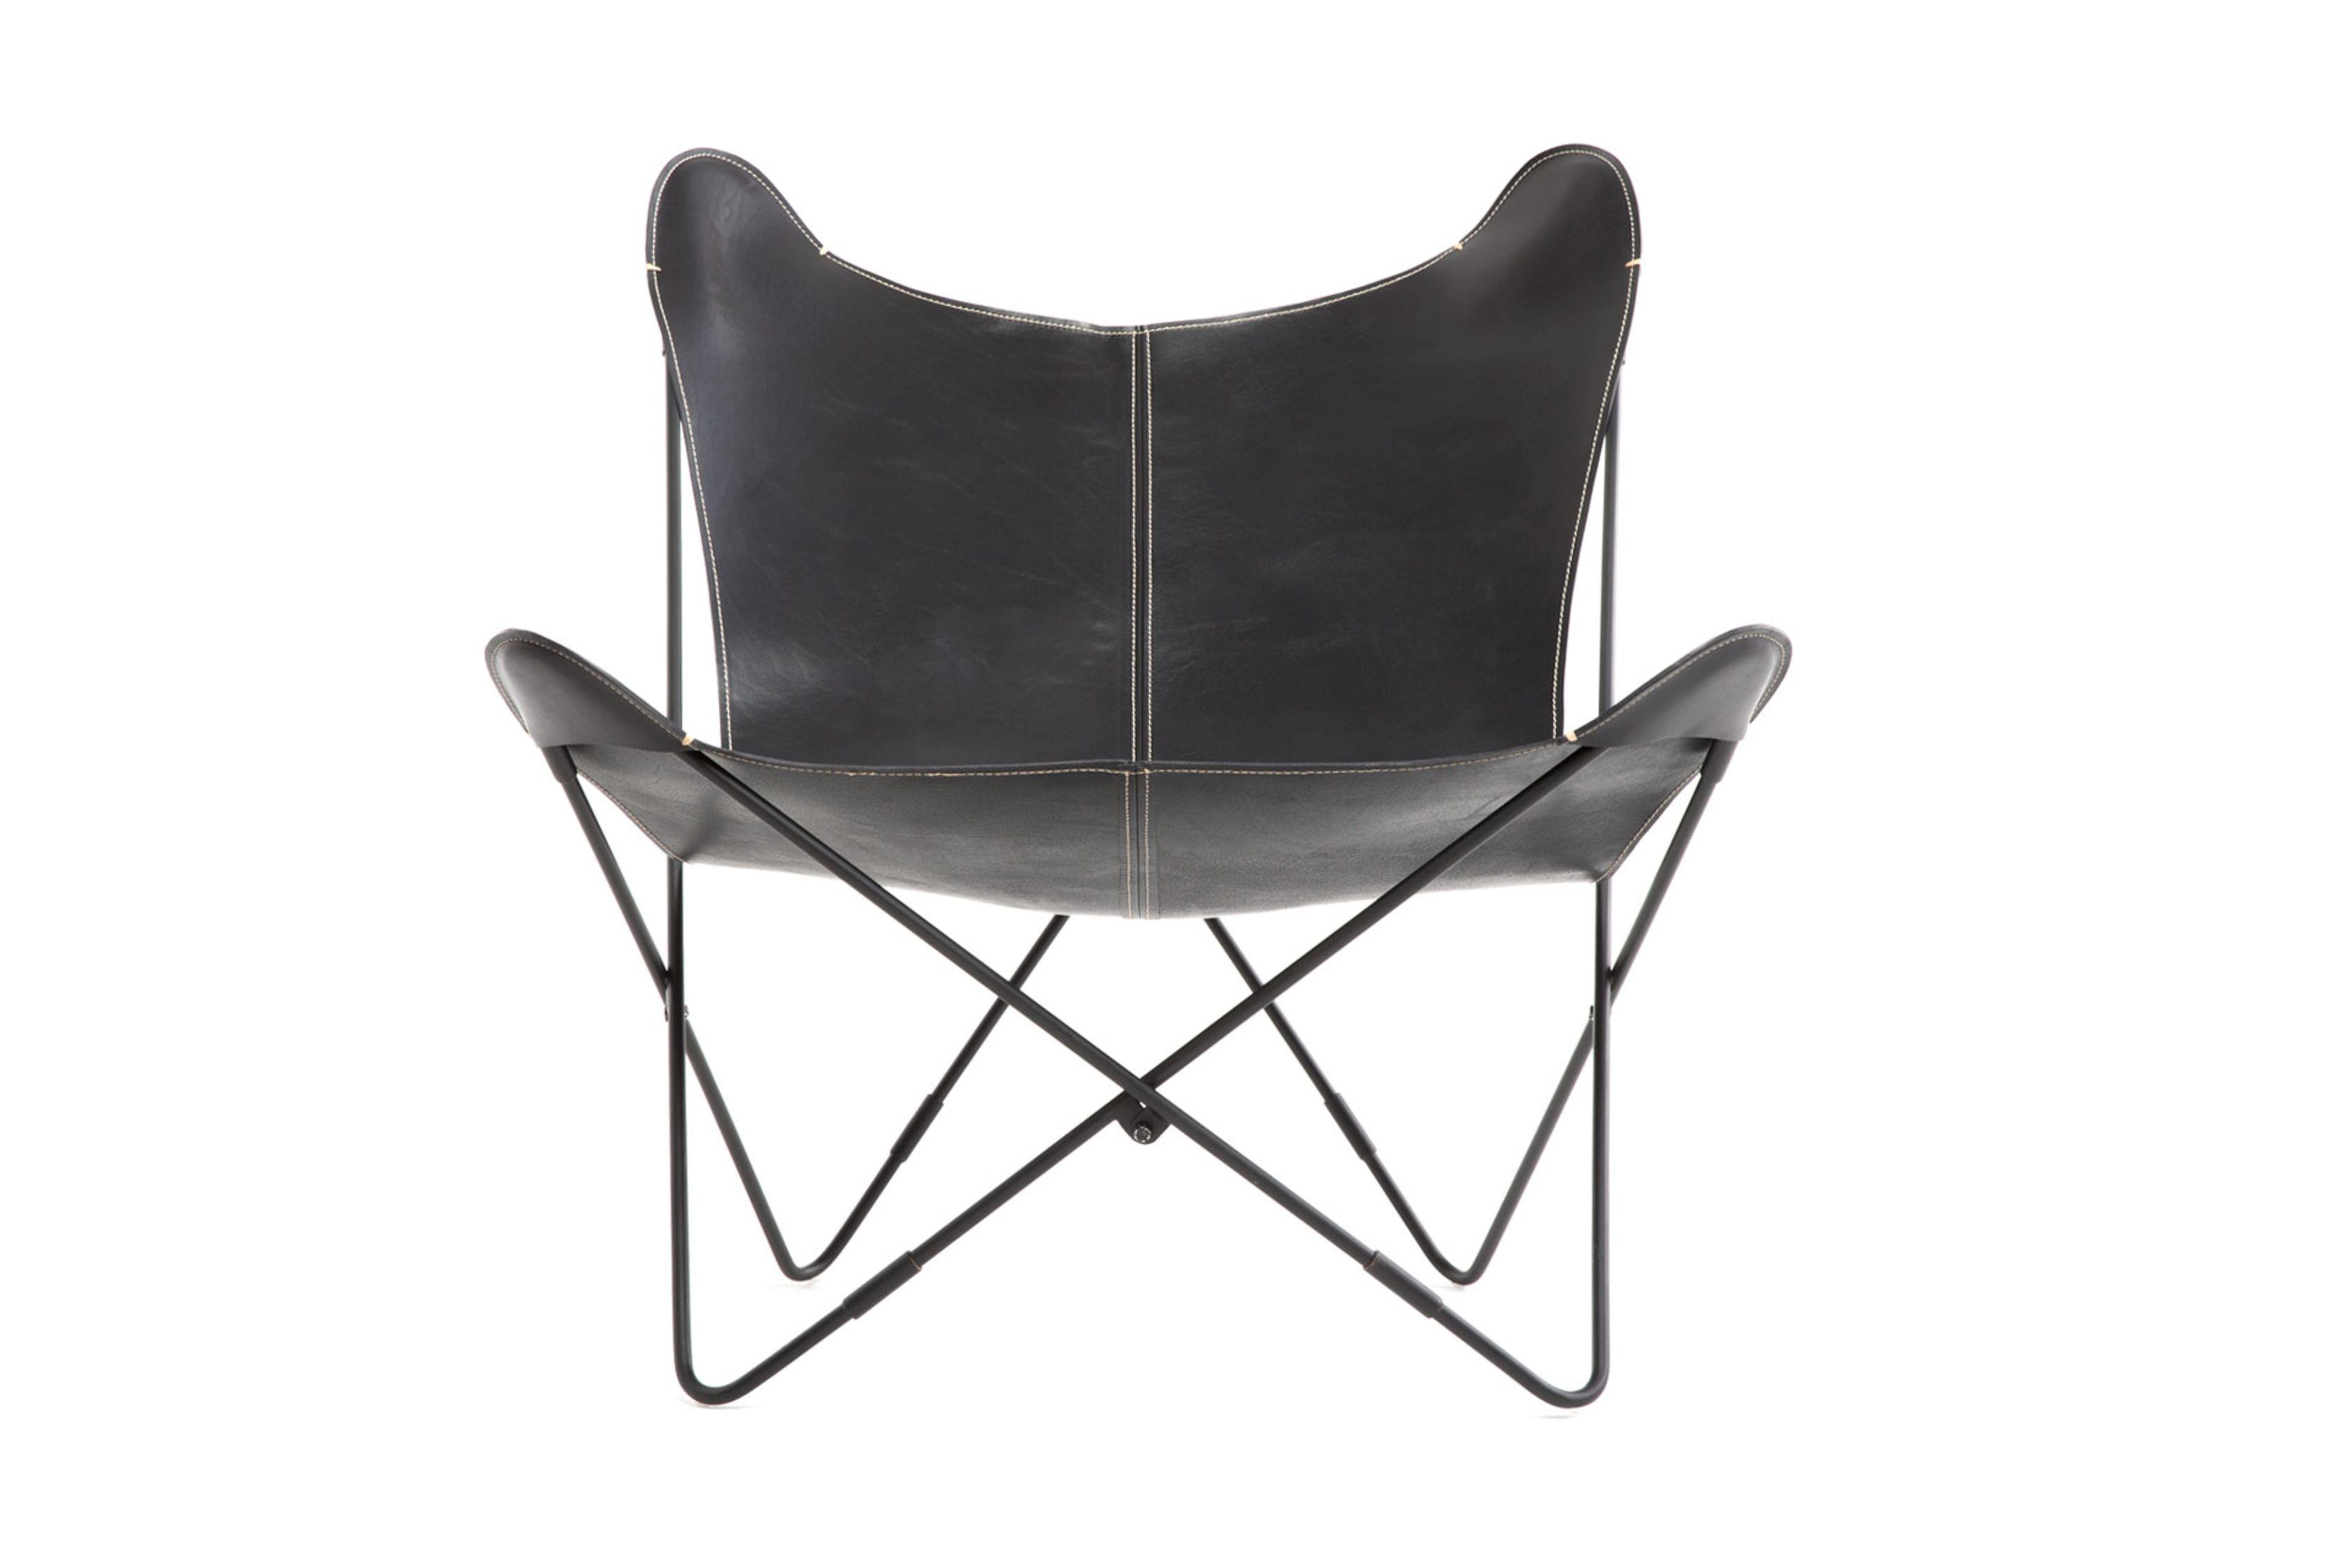 memory foam butterfly chair home depot adirondack plans leder black stuhl